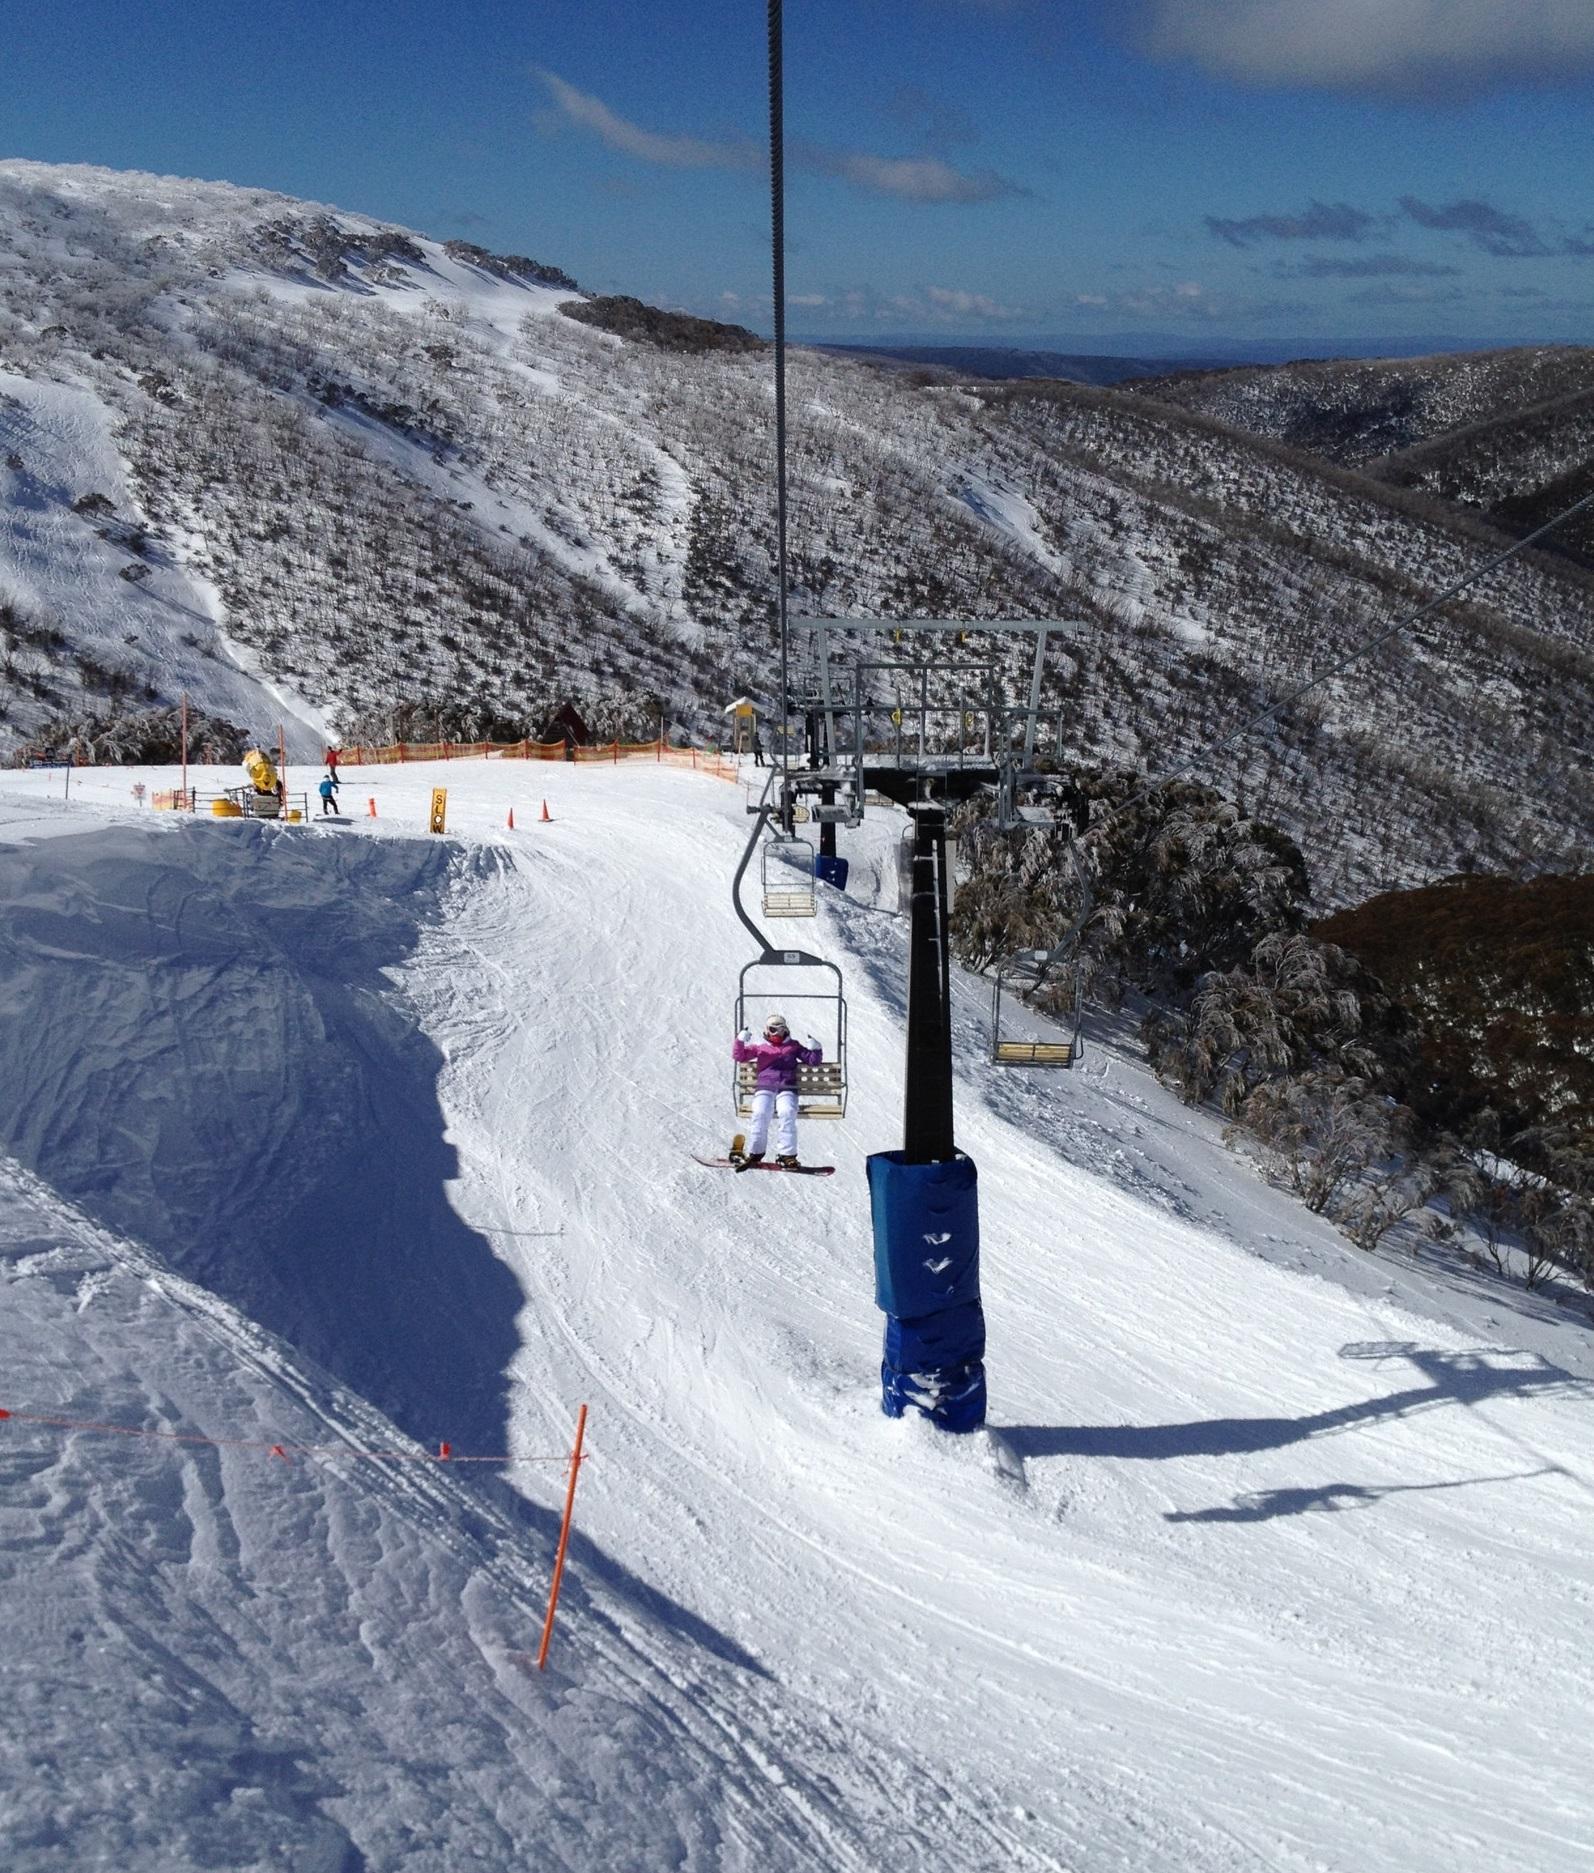 Hotham Playground by Snowbound cropped version 73435_ba240743f51c2f44914ba7f0c60e979b.jpg